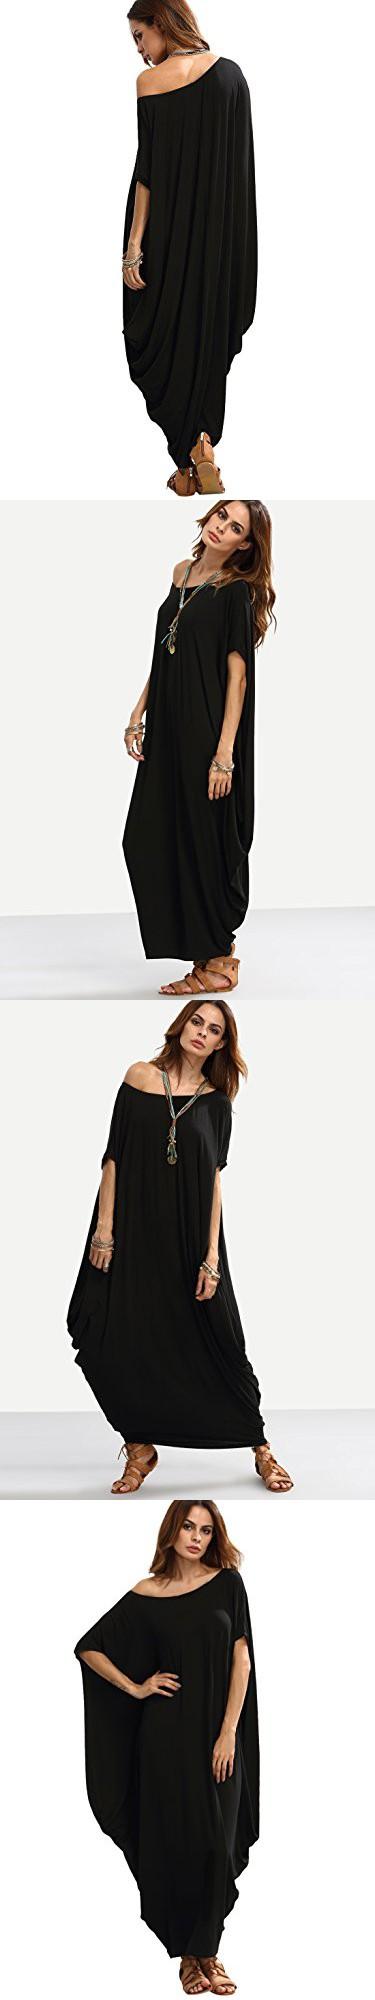 4ae4682a072 Verdusa Women s Boho One Off Shoulder Caftan Sleeve Harem Maxi Dress Black M